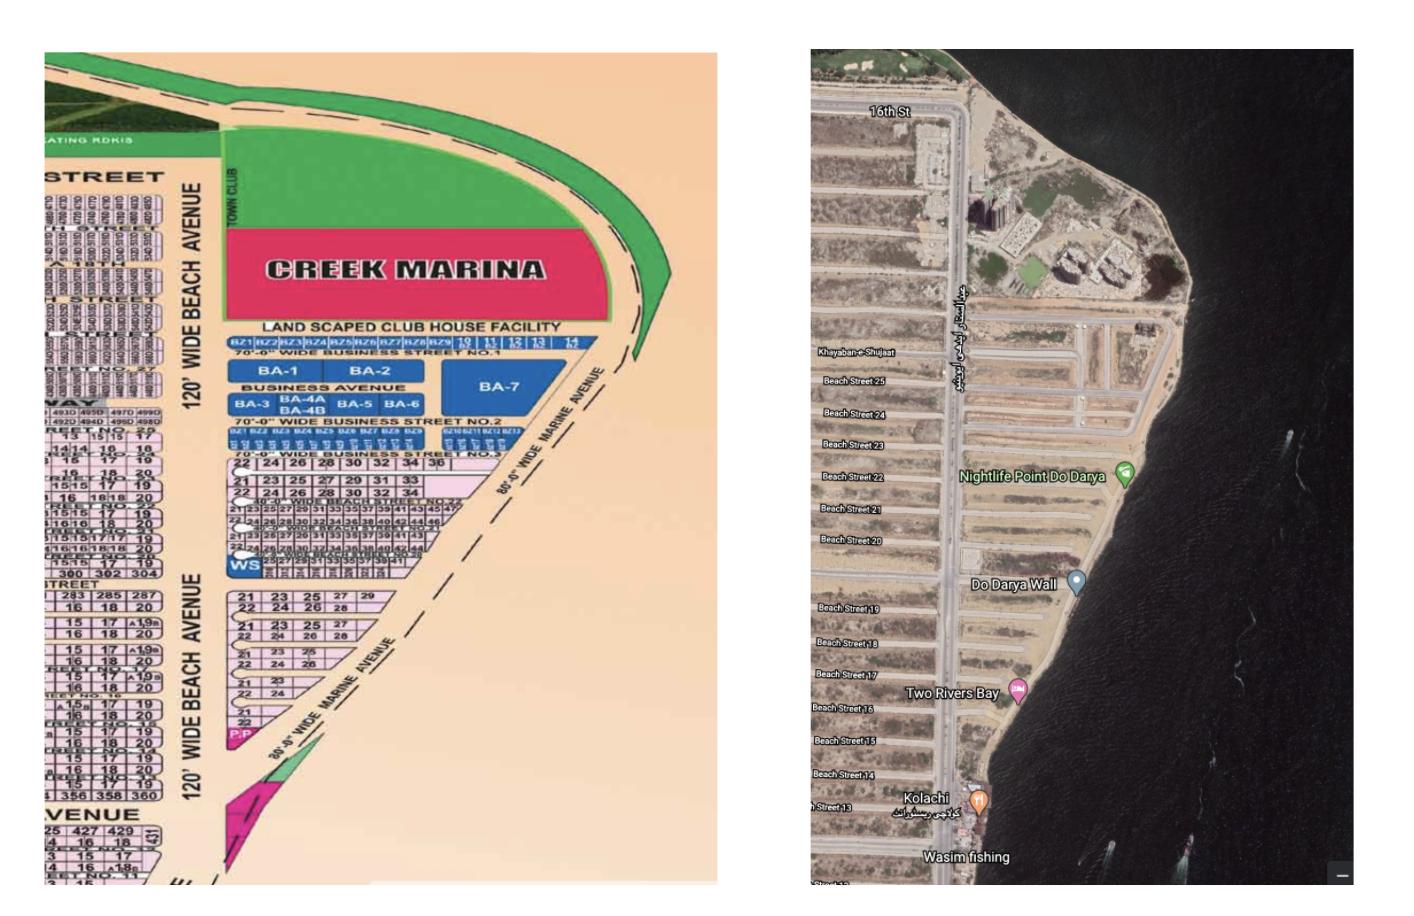 DHA map of Creek Marina, alongside Google Maps satellite imagery